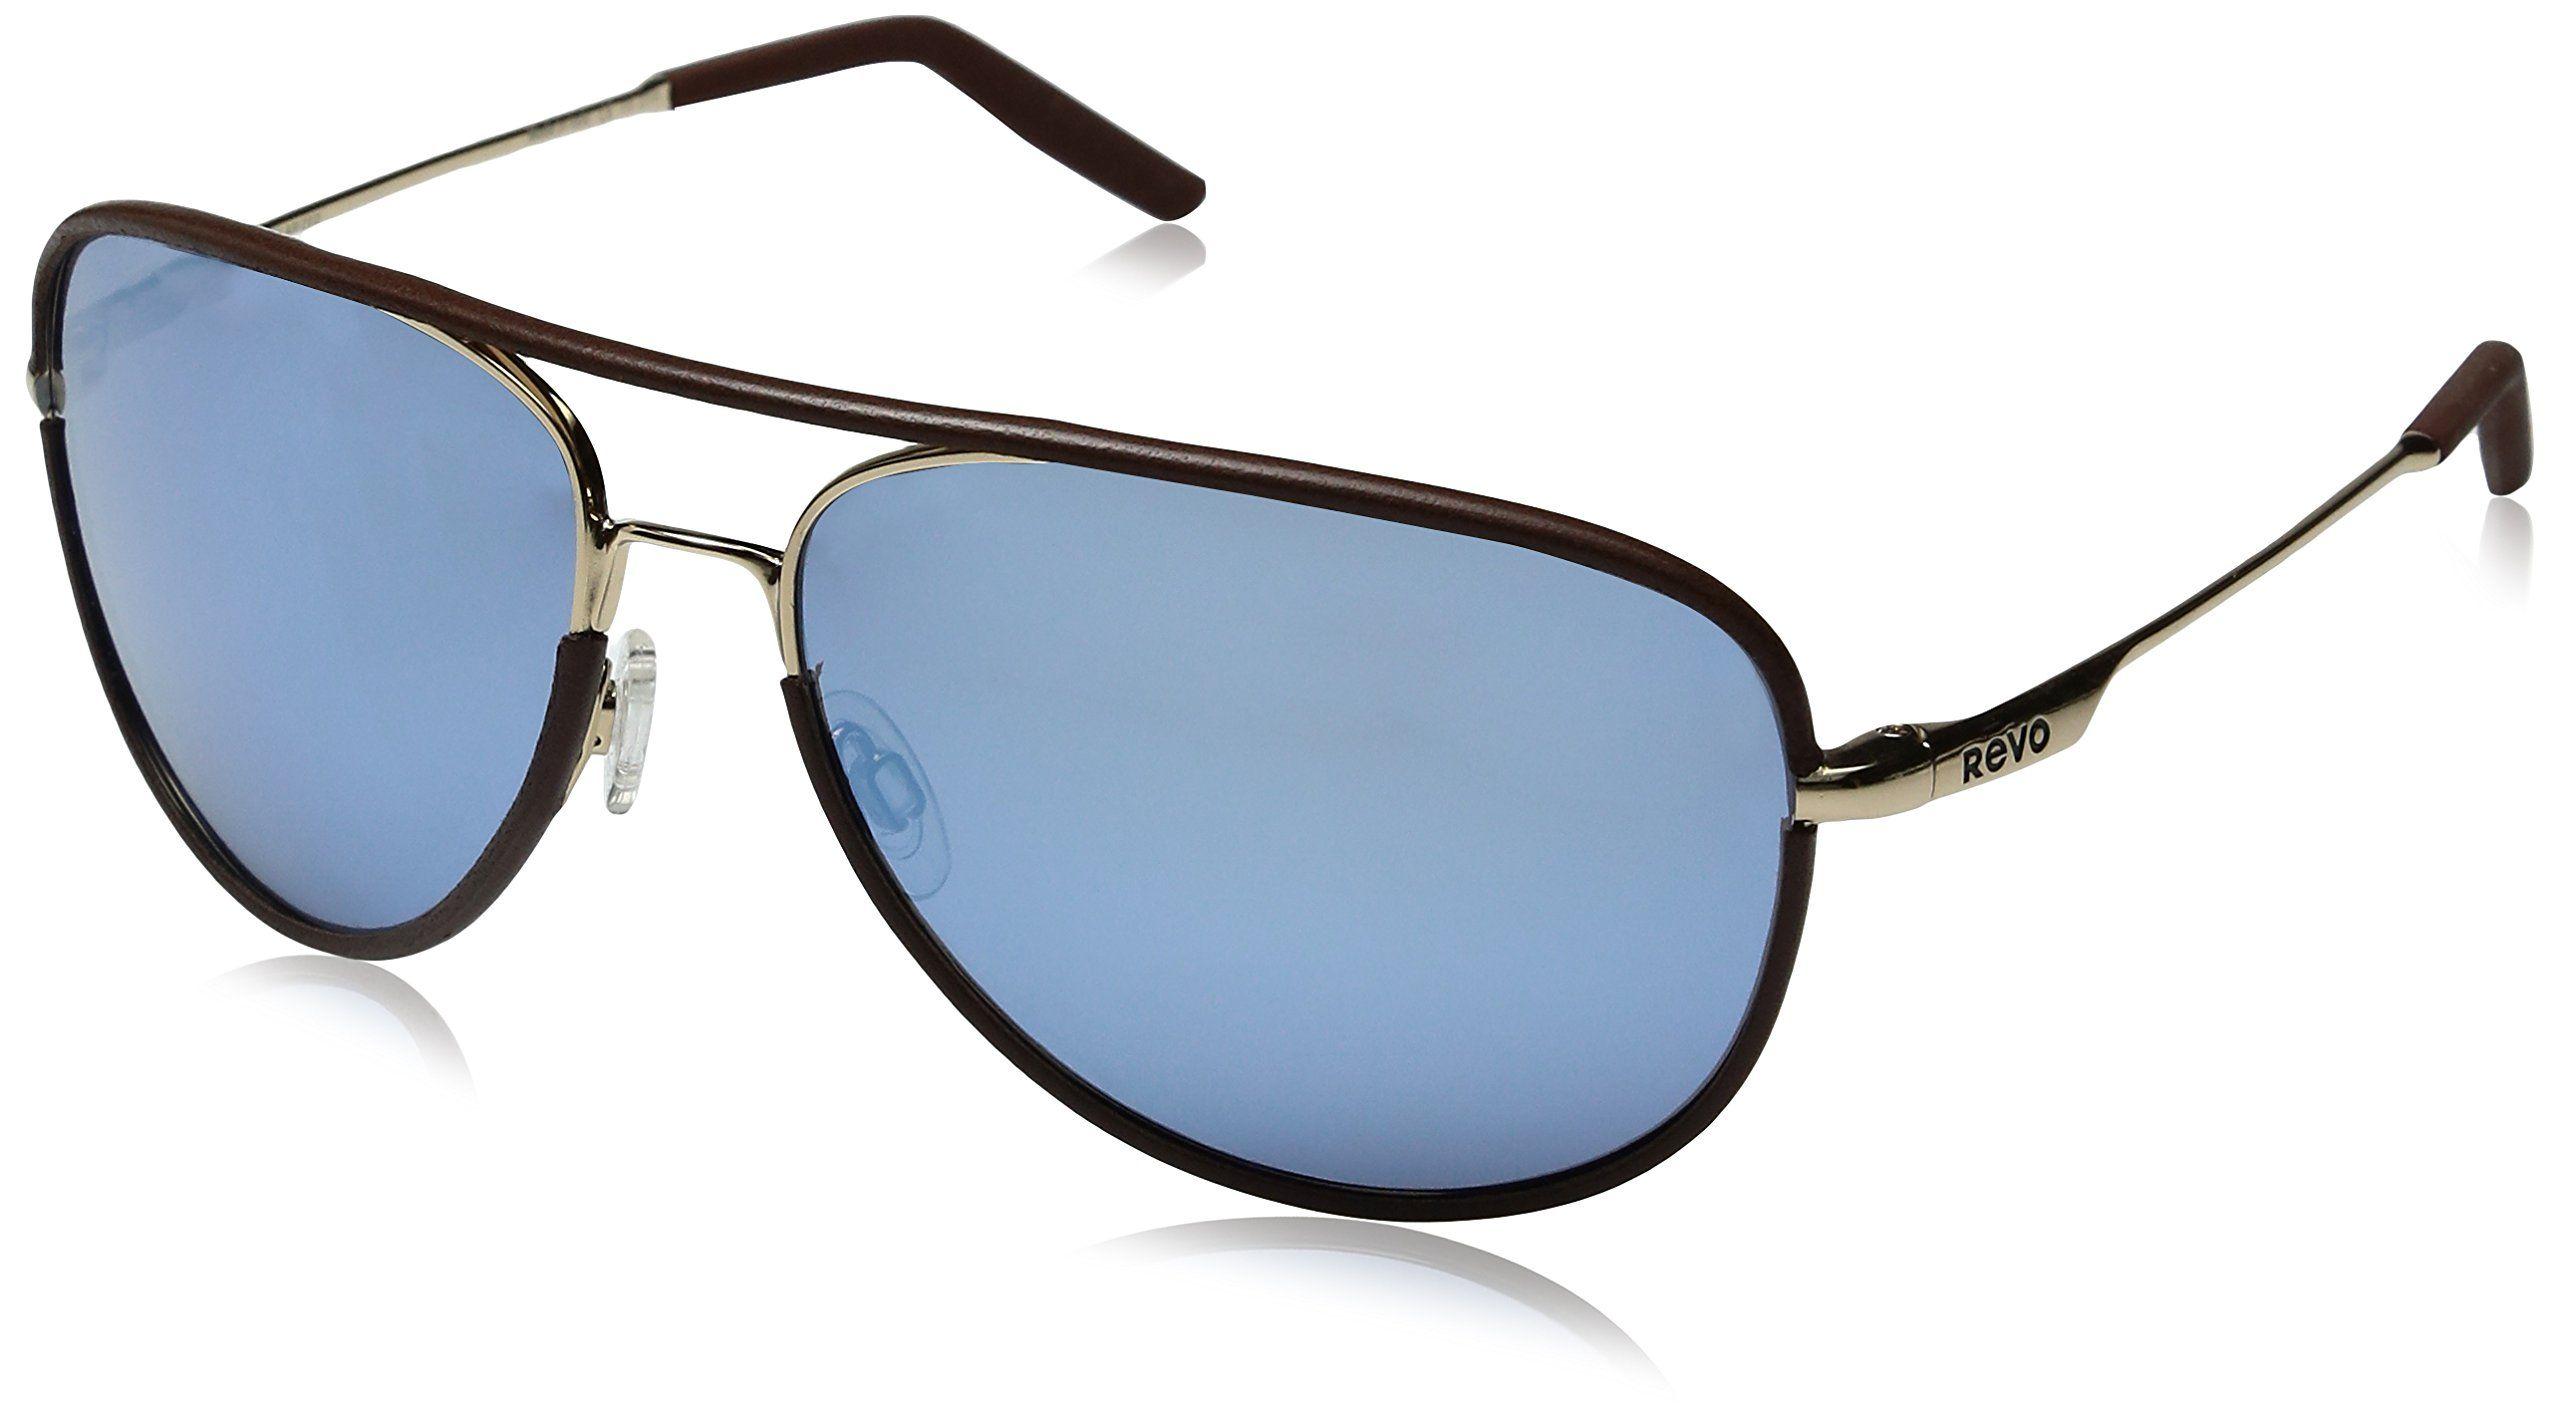 5b78e83d8ca Revo Carlisle Polarized Aviator Sunglasses